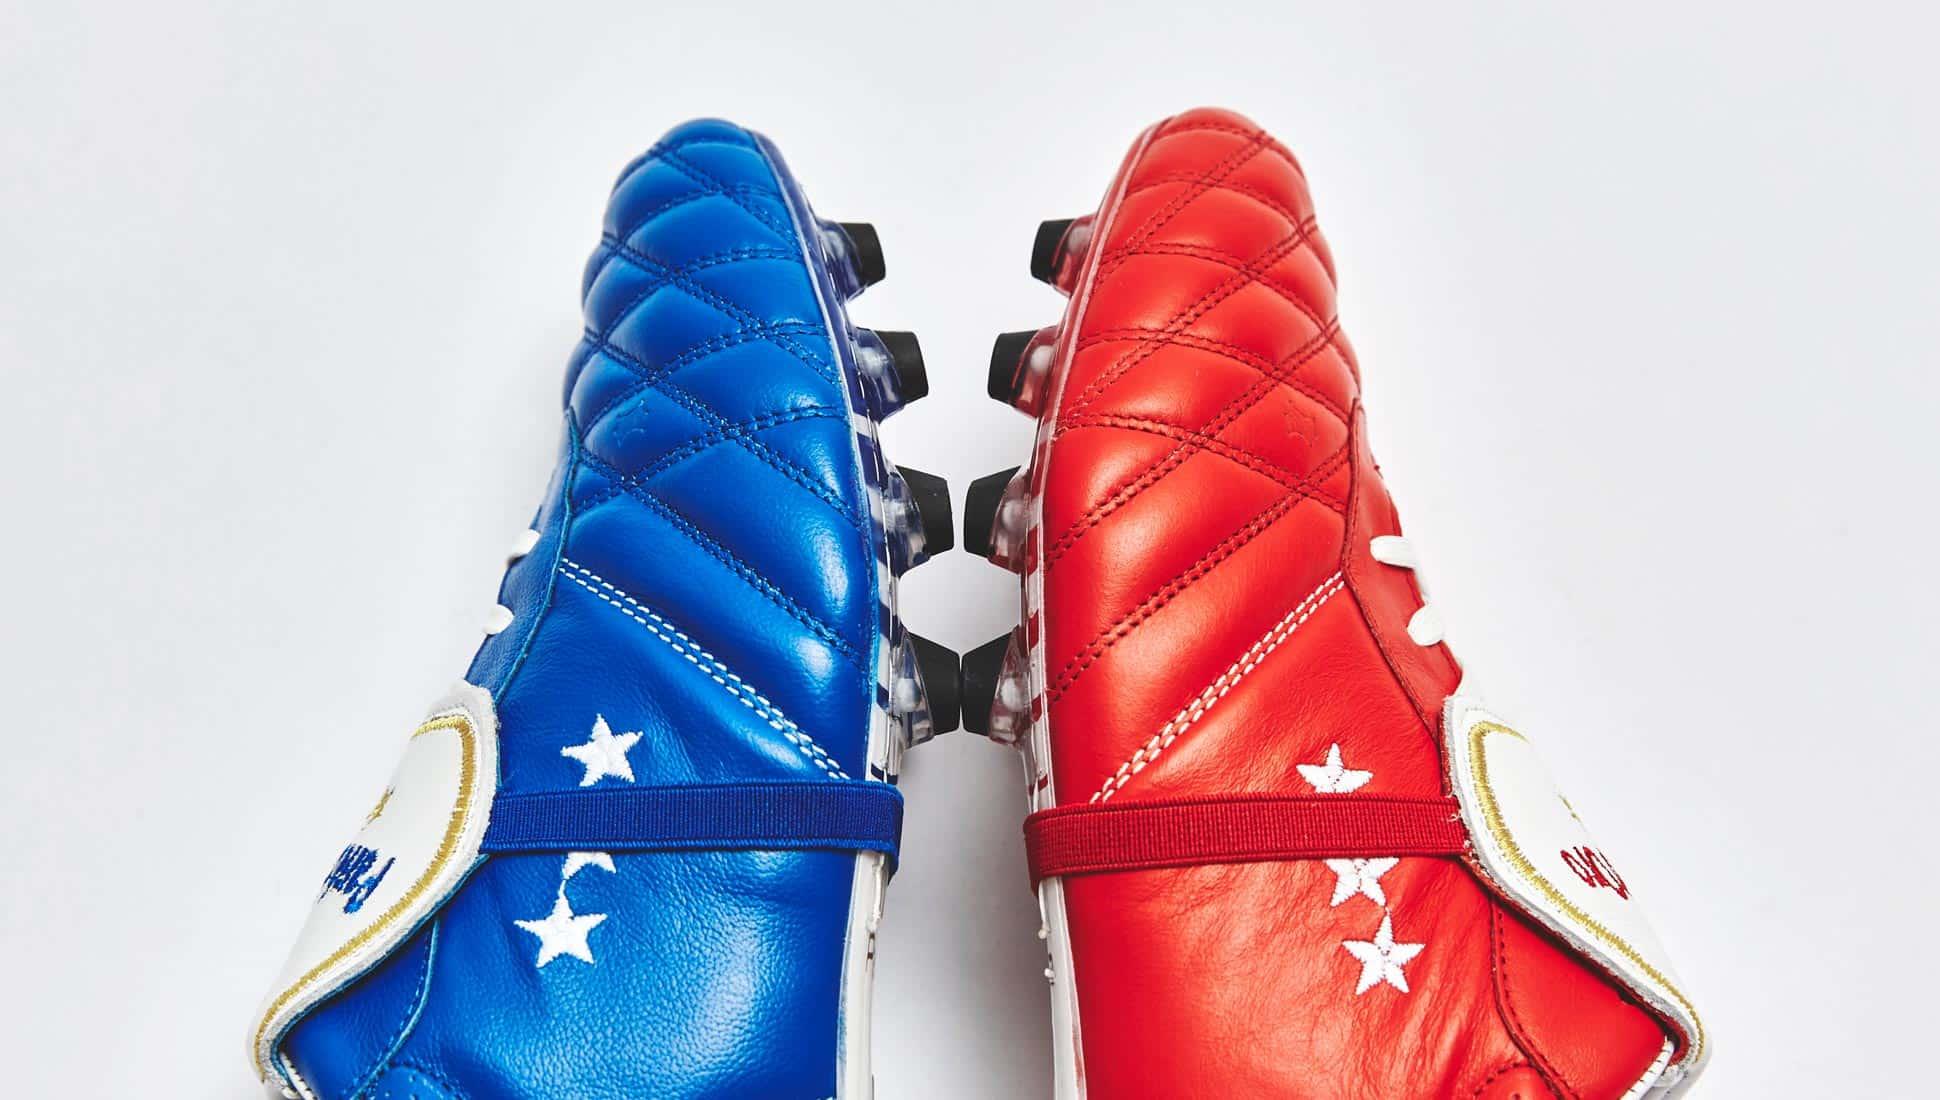 chaussures-football-pantofola-doro-emidio-italia-red-blue-2